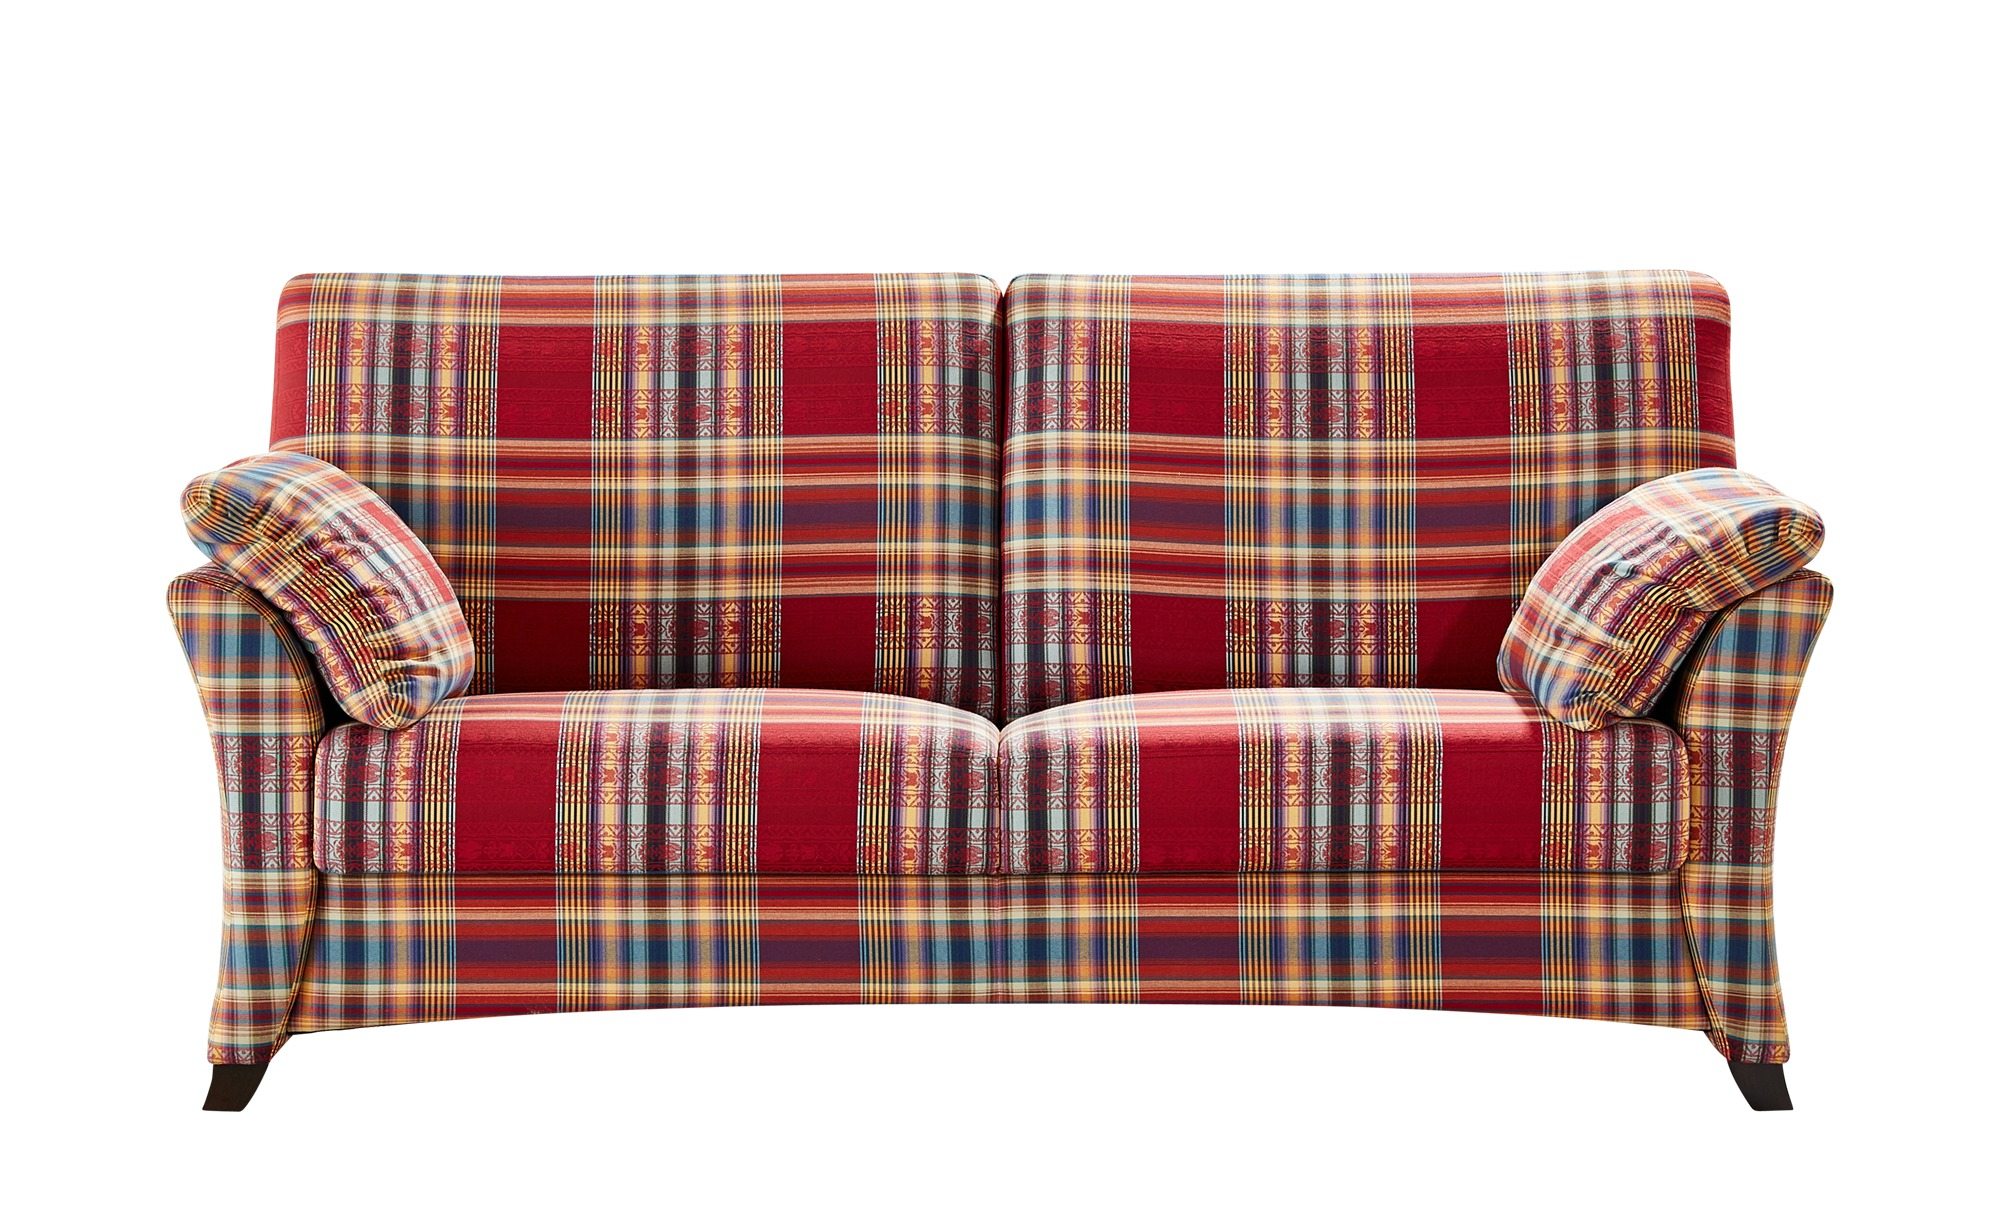 Sofa 3-sitzig rot/kariert - Webstoff Mikado ¦ mehrfarbig ¦ Maße (cm): B: 196 H: 93 T: 91 Polstermöbel > Sofas > 3-Sitzer - Höffner